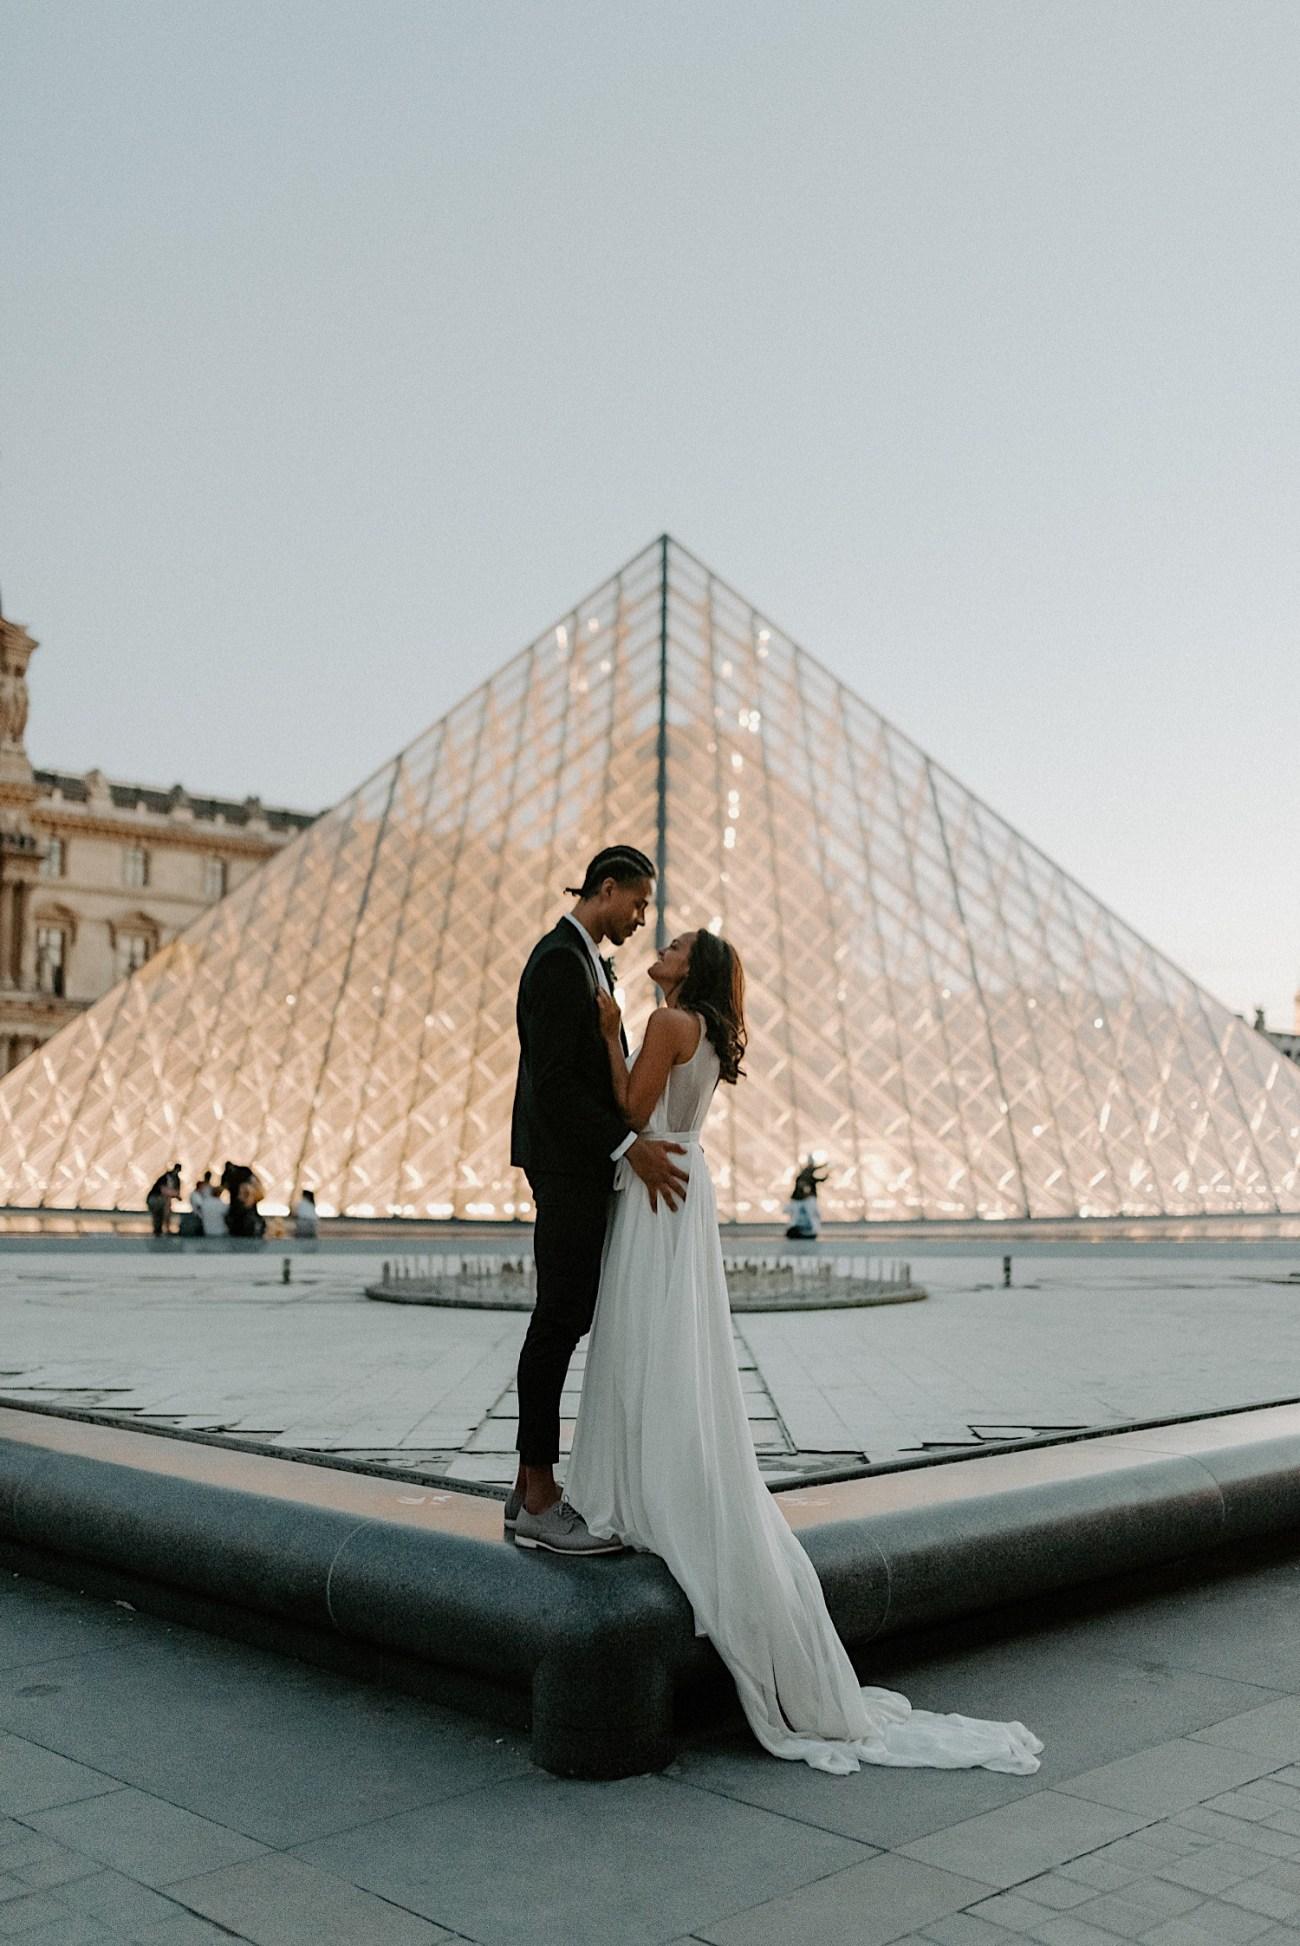 Paris Louvre Wedding Photos Paris Wedding Photographer Destination Wedding France Anais Possamai Photography 28